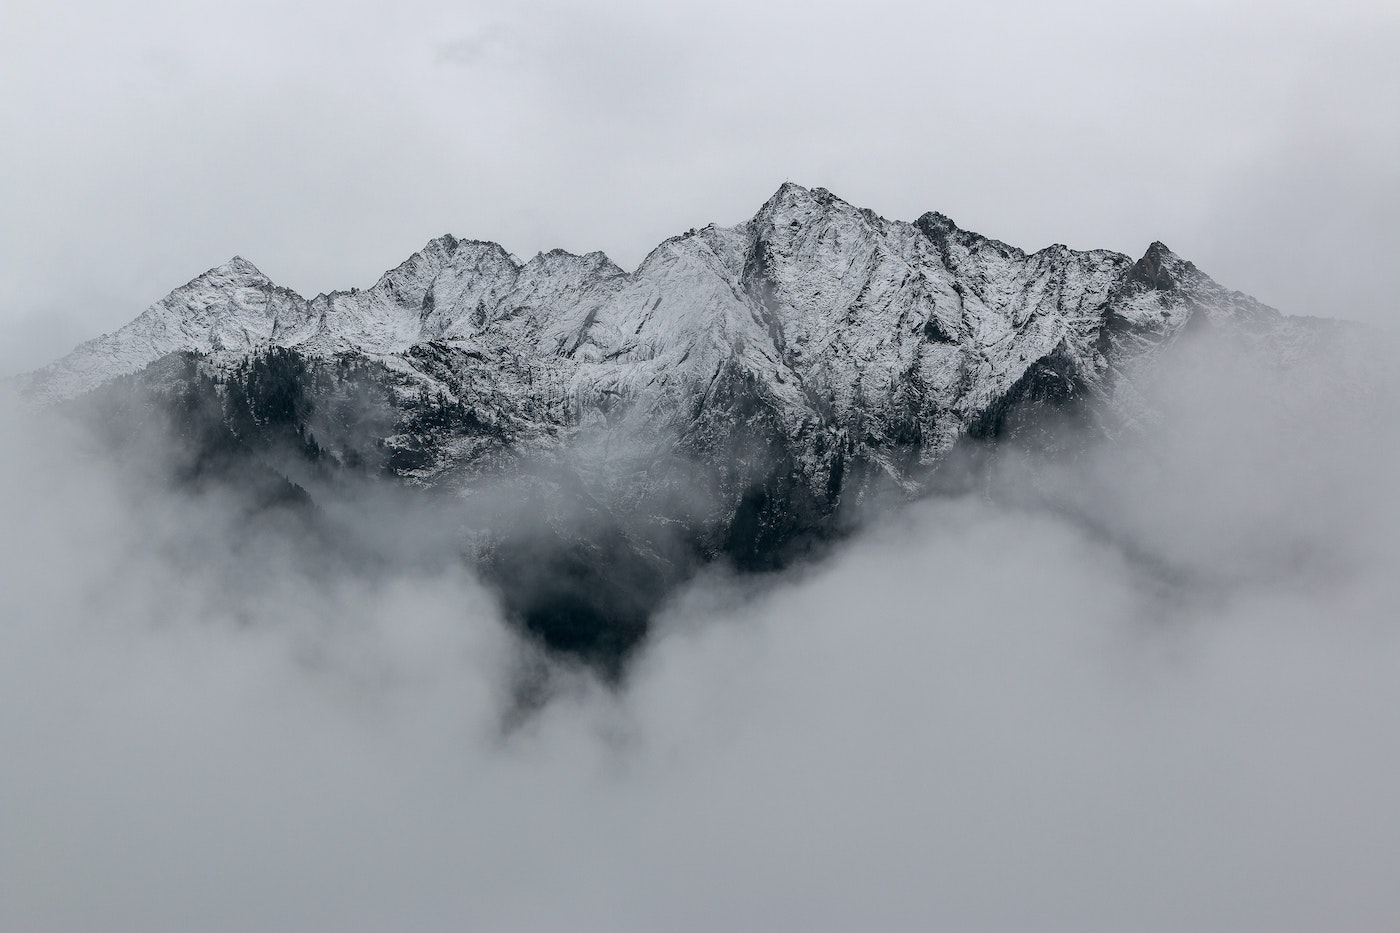 Mountain Hidden in Mist